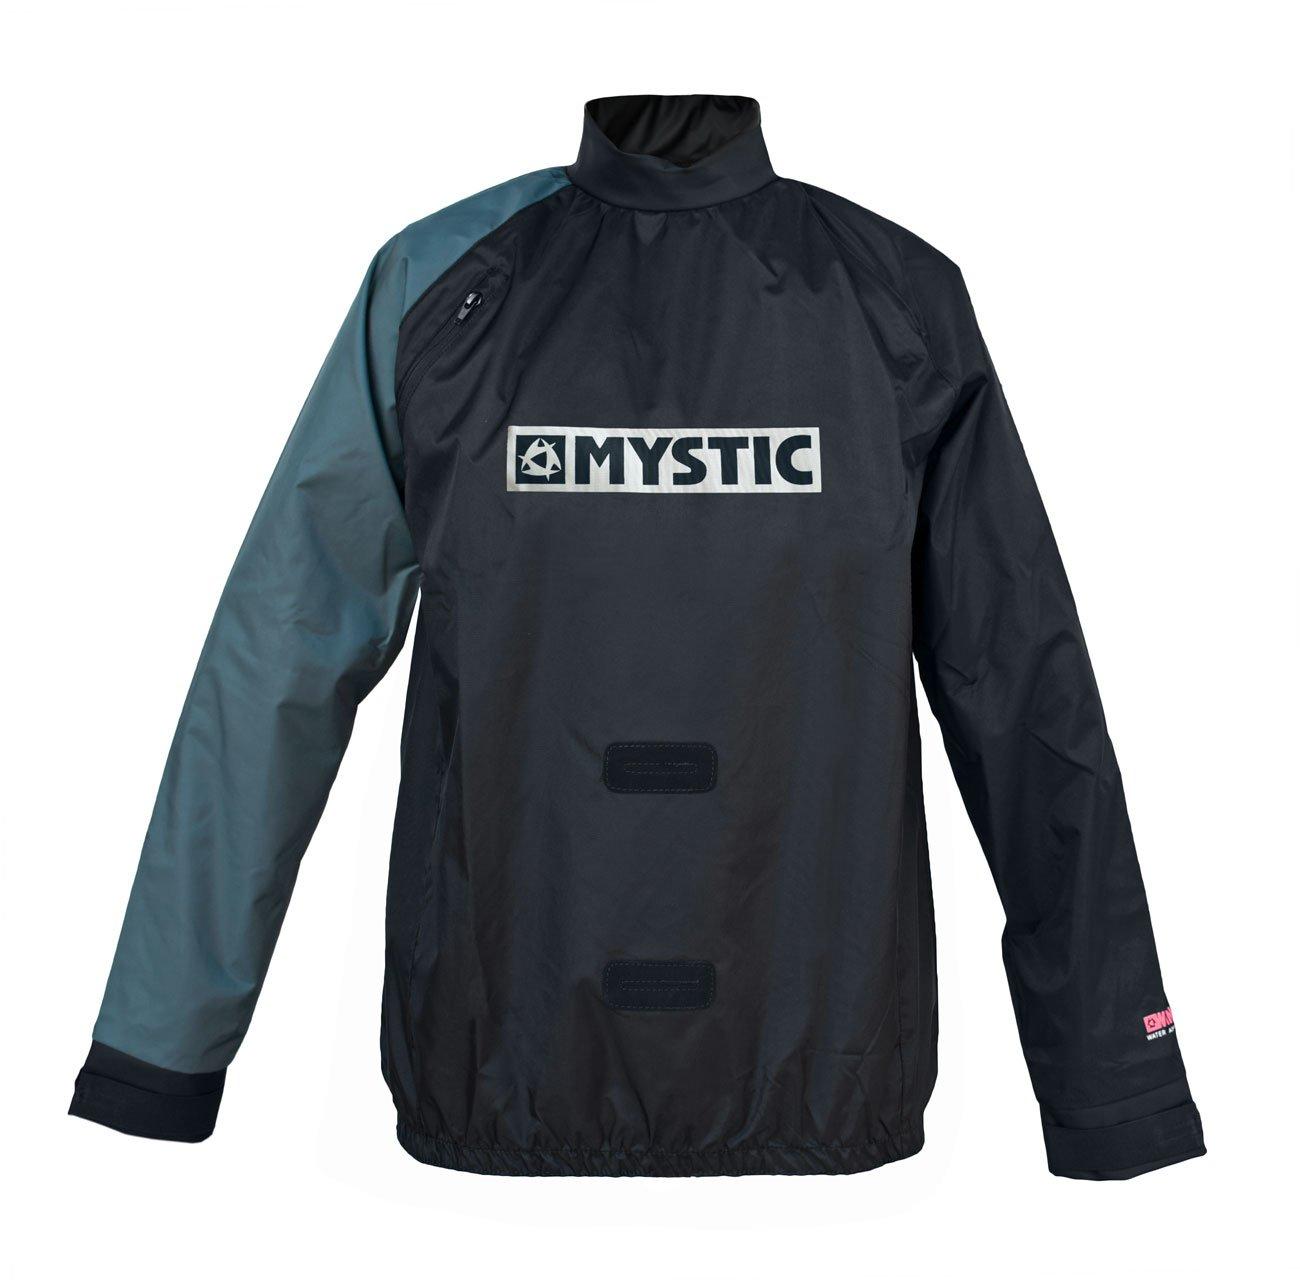 Mystic Kite Windstopper Jacket 140160